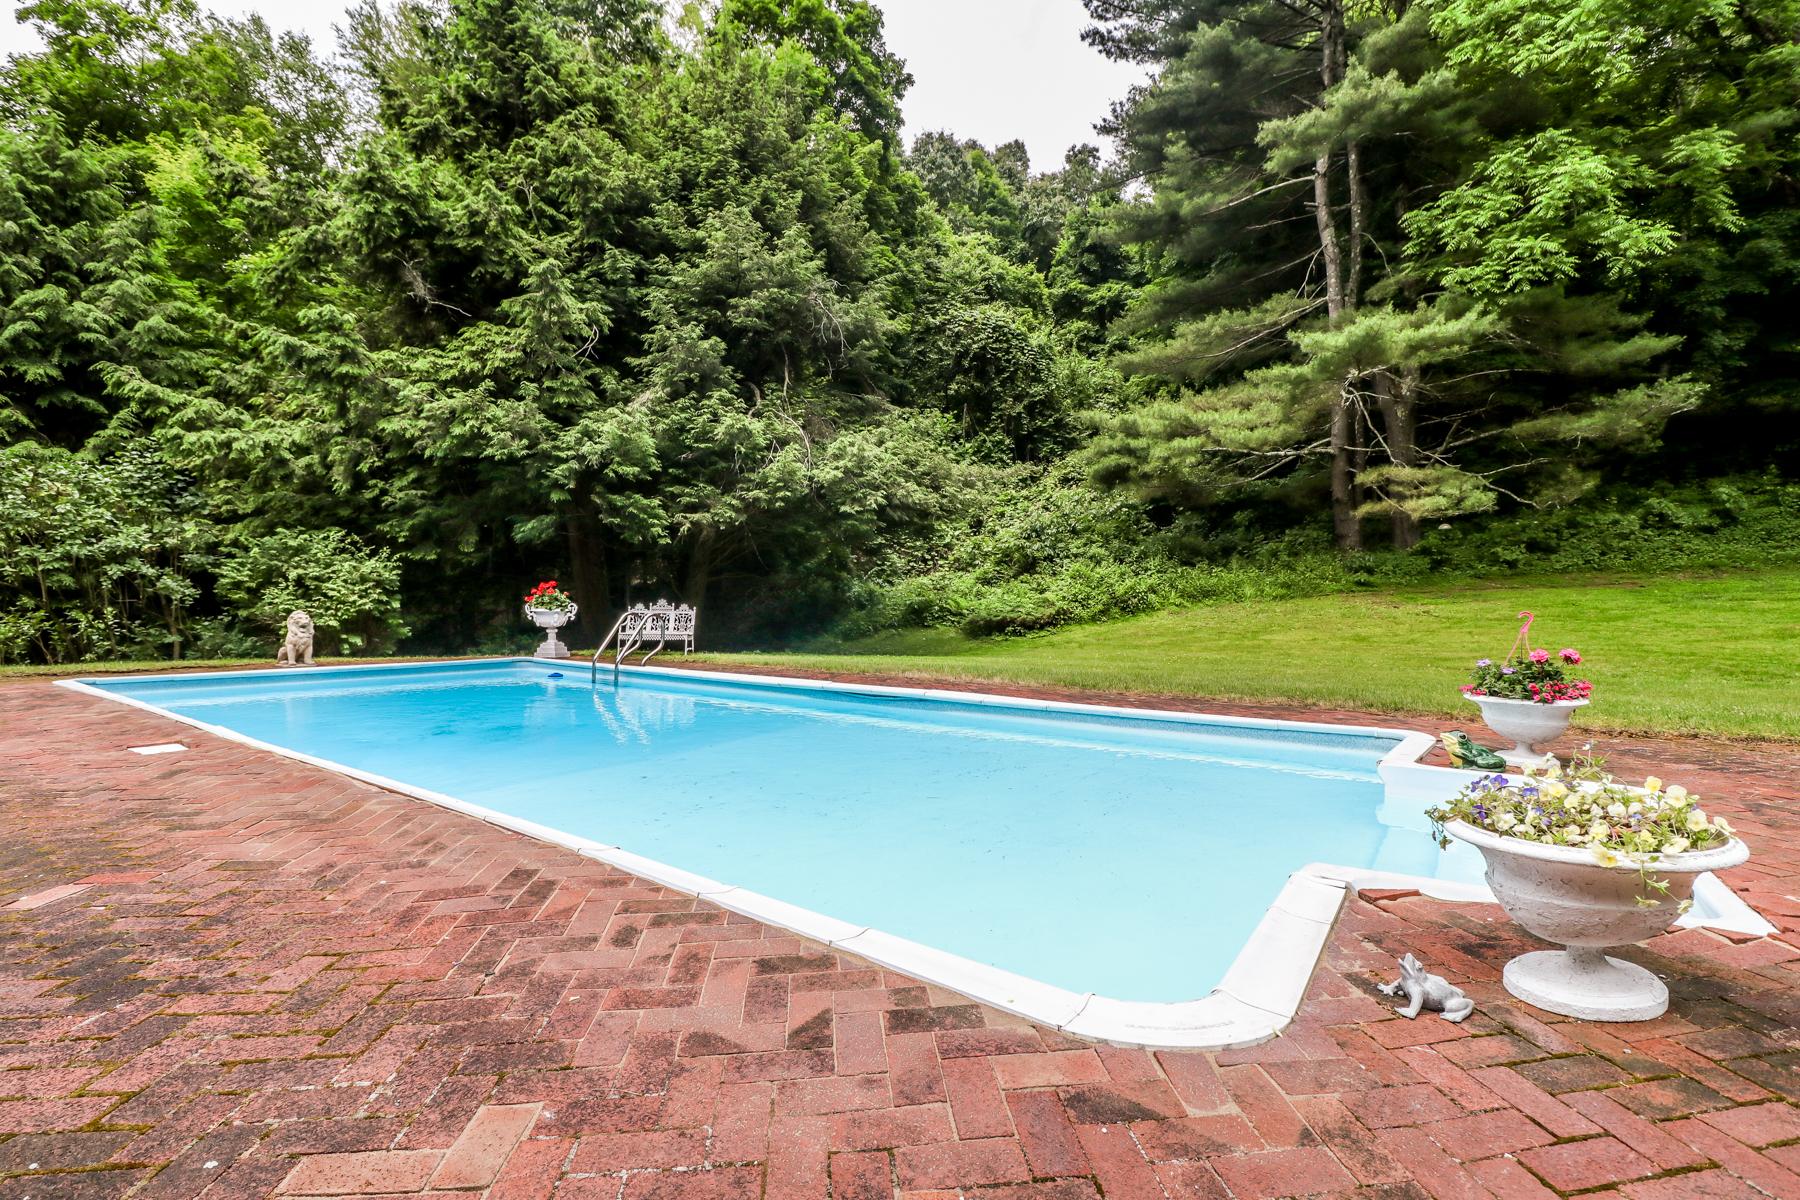 Single Family Homes для того Продажа на Charm And Natural Beauty 35 Obtuse Road, Newtown, Коннектикут 06470 Соединенные Штаты